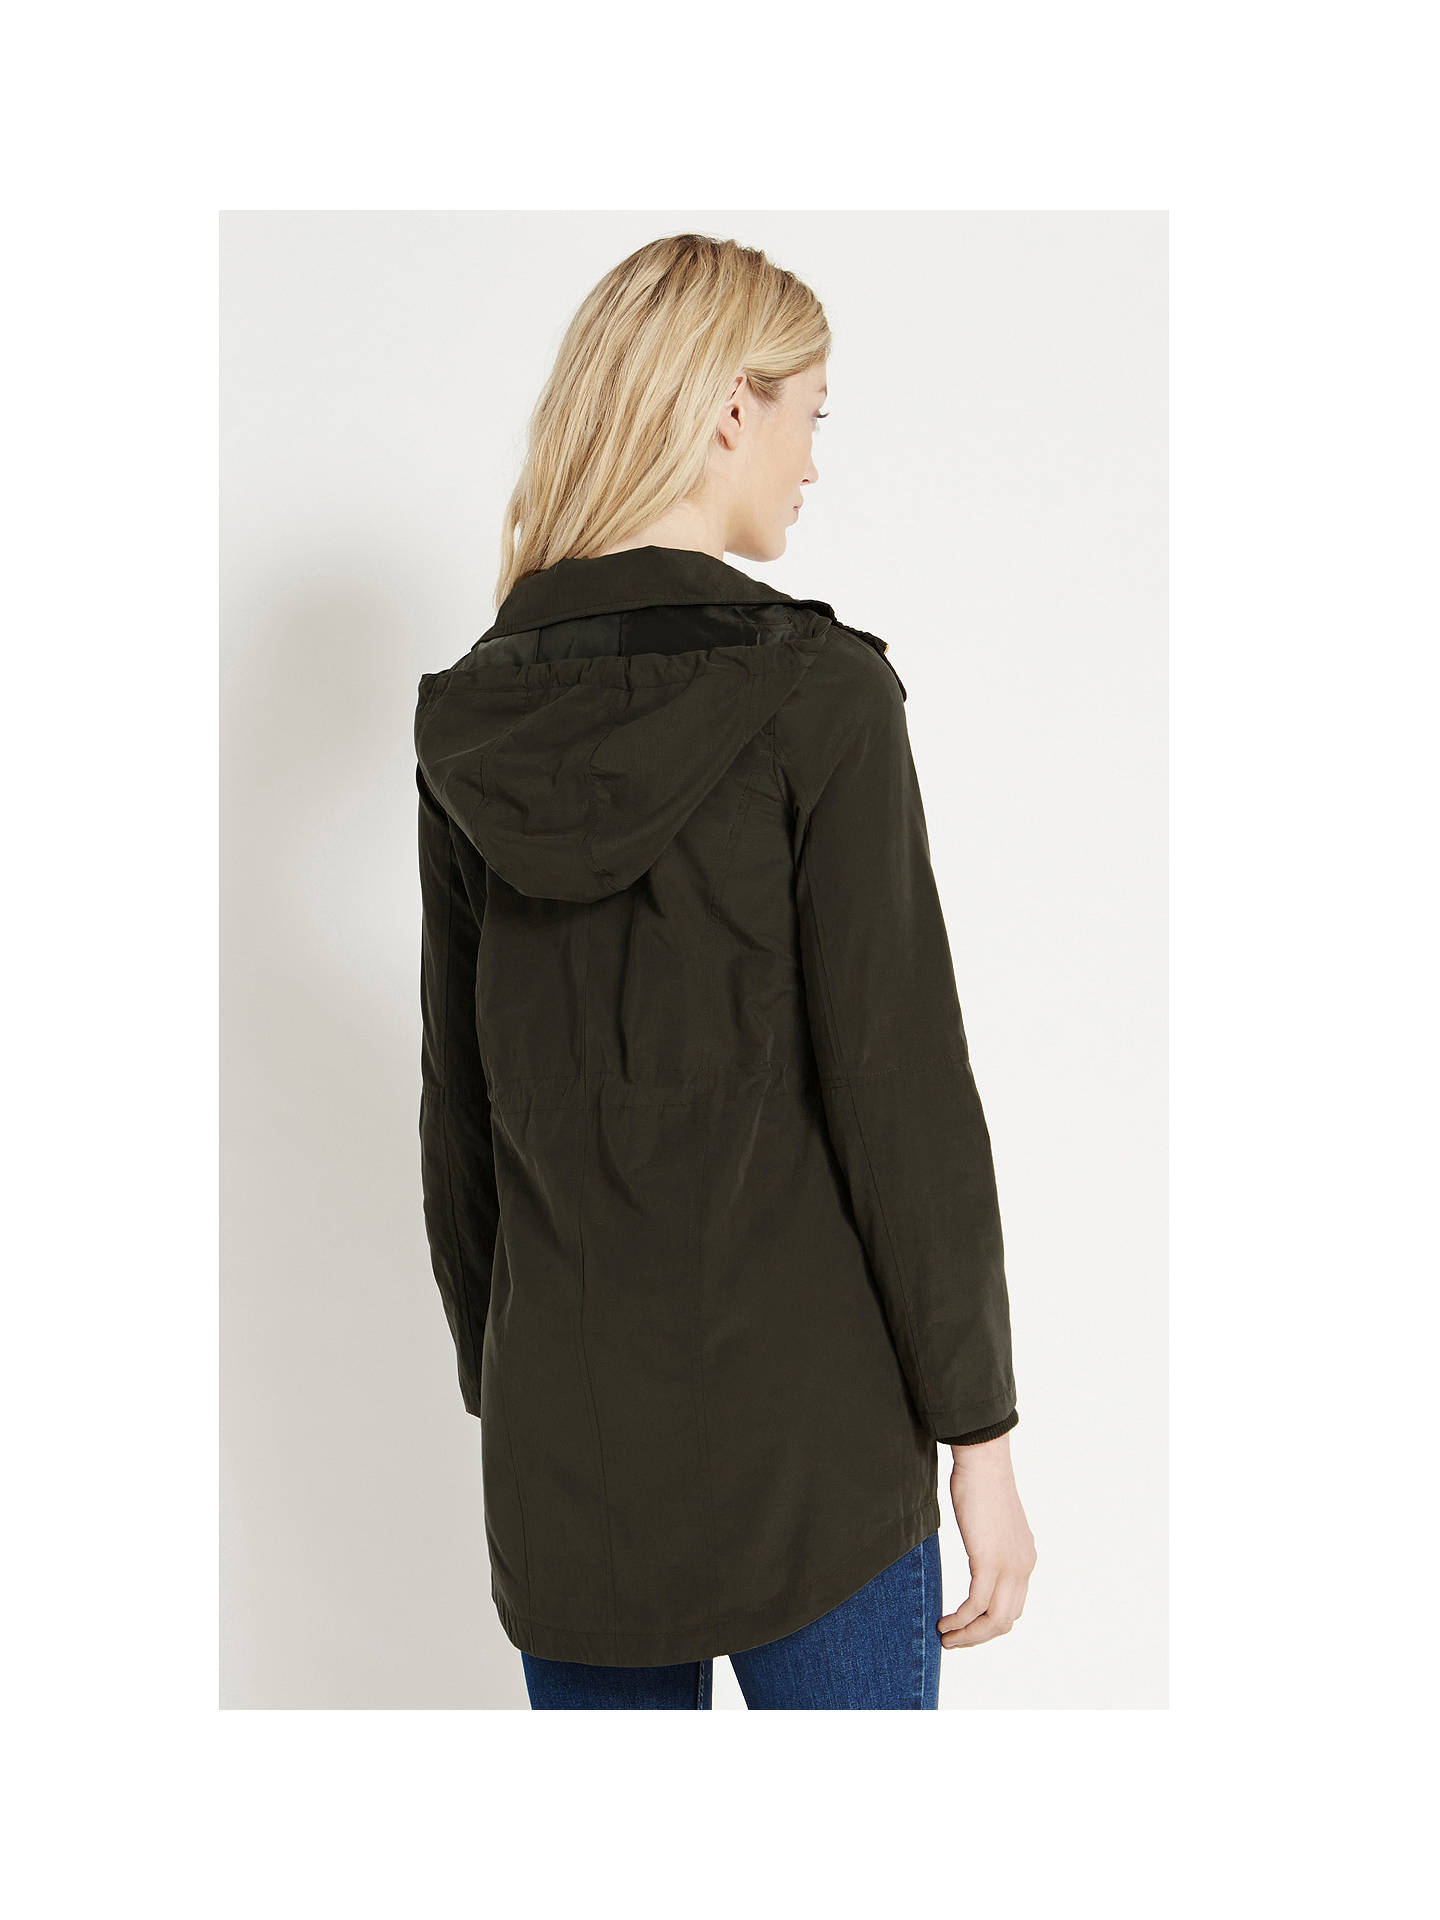 35a30117a73f ... Buy Oasis Charlie Lightweight Parka Jacket, Khaki, S Online at  johnlewis.com ...